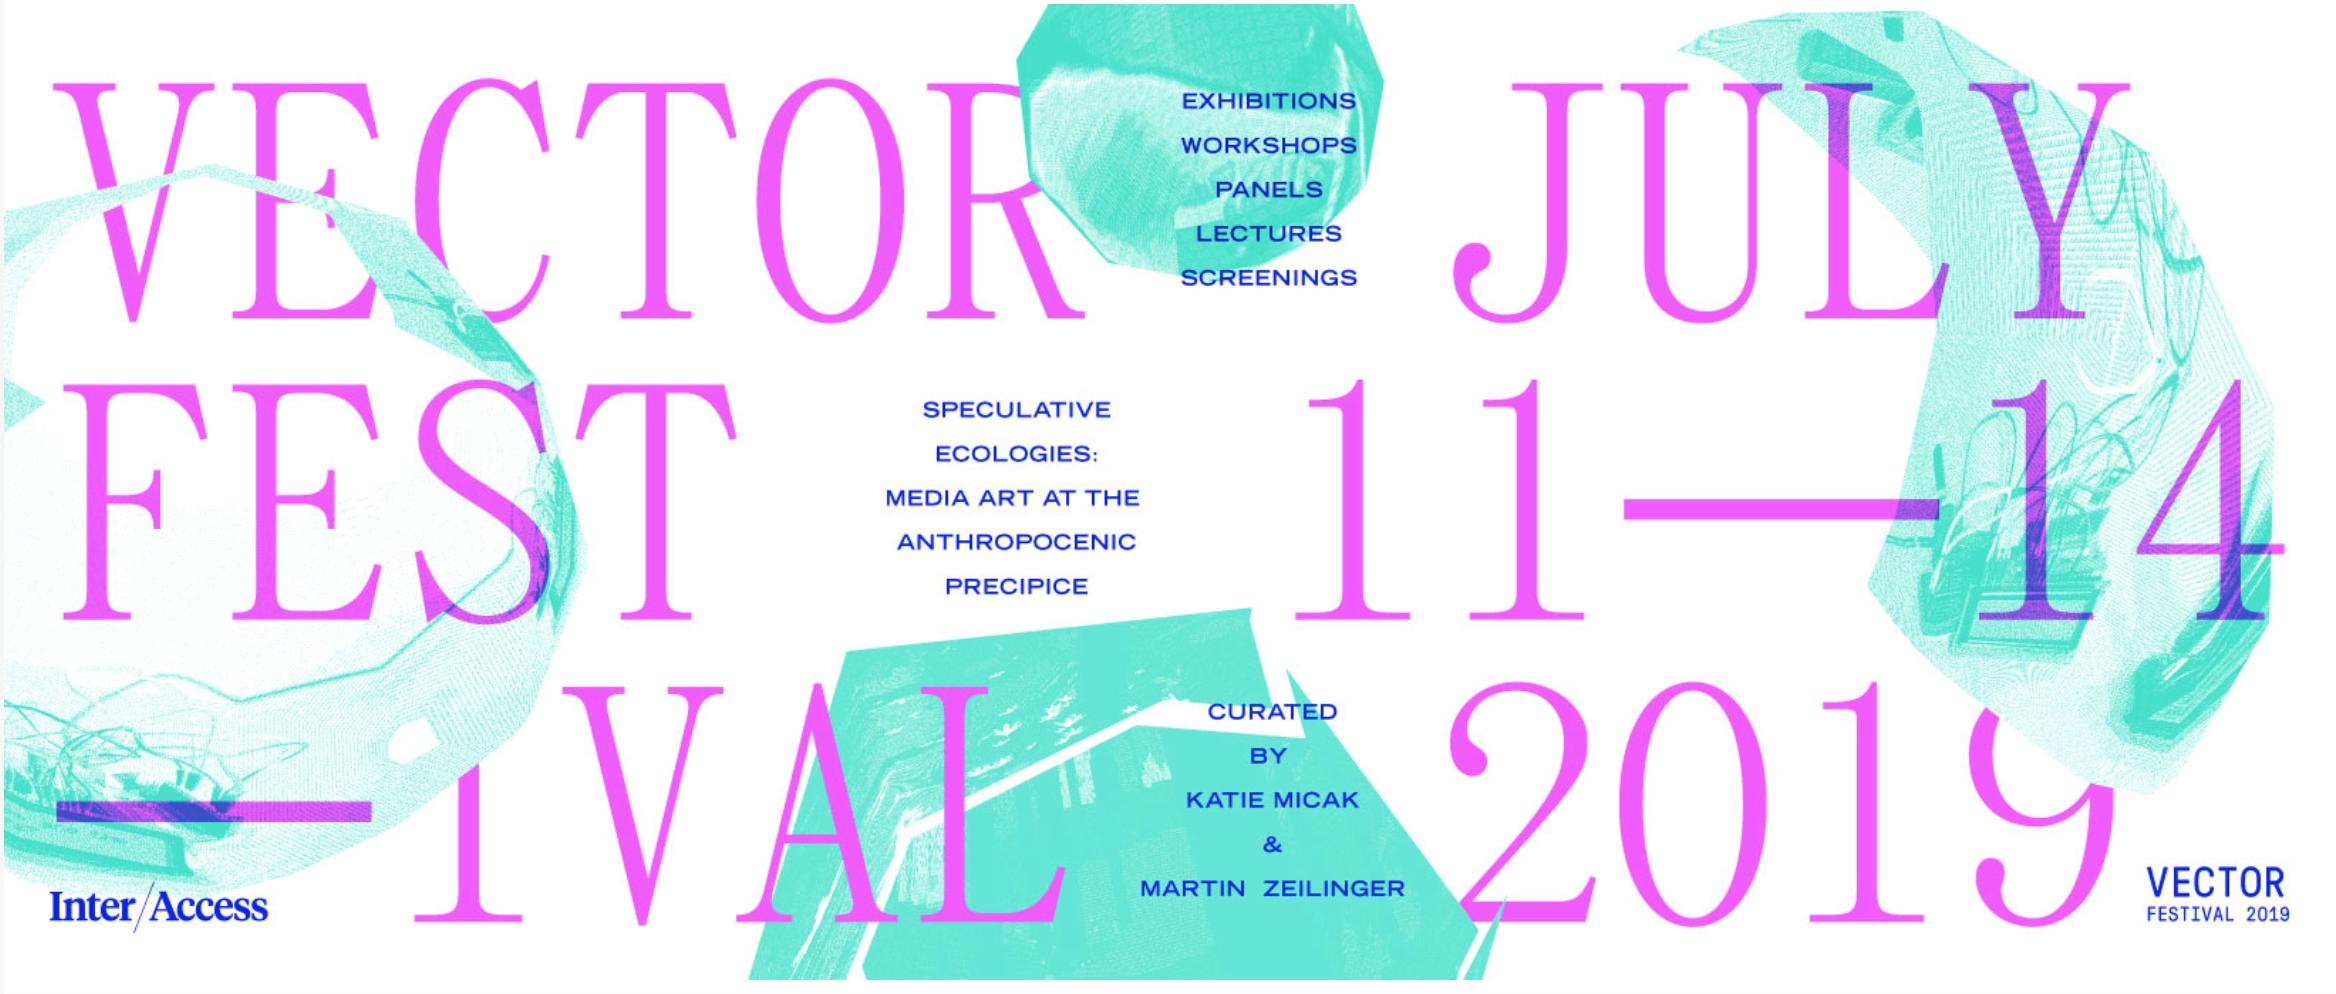 Vector Festival